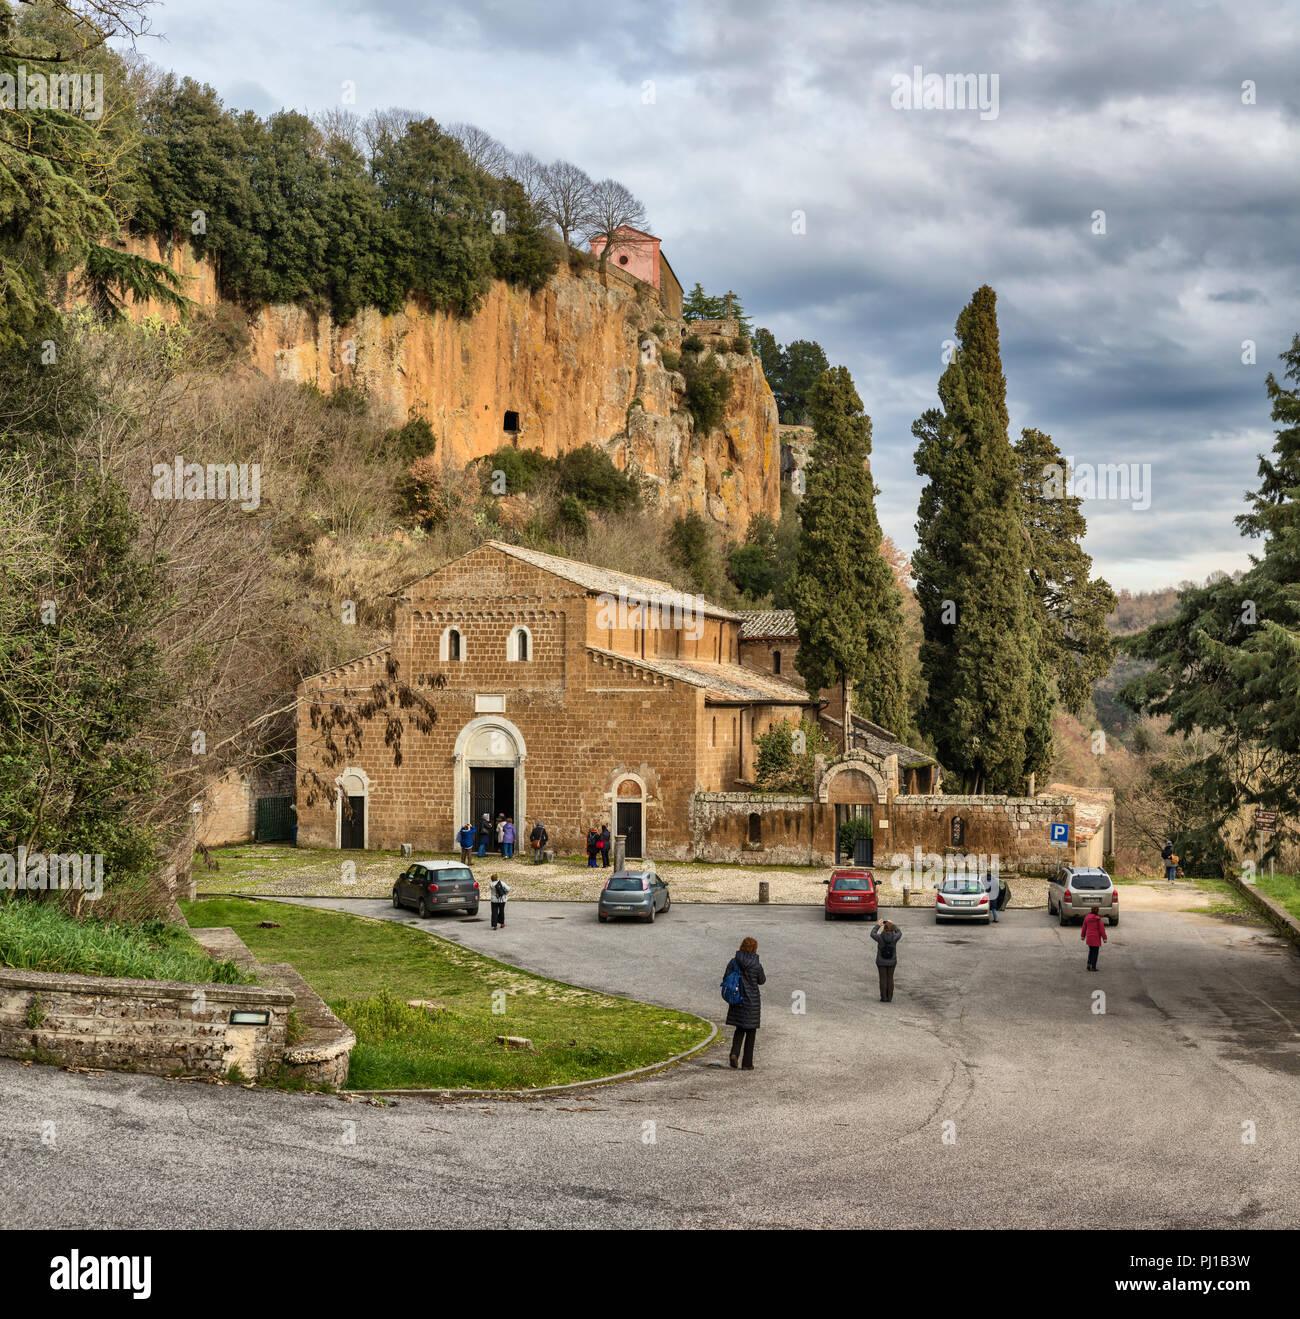 Castel Sant Elia Italia.Basilica Of Sant Elia Castel Sant Elia Viterbo Lazio Italy Stock Photo Alamy